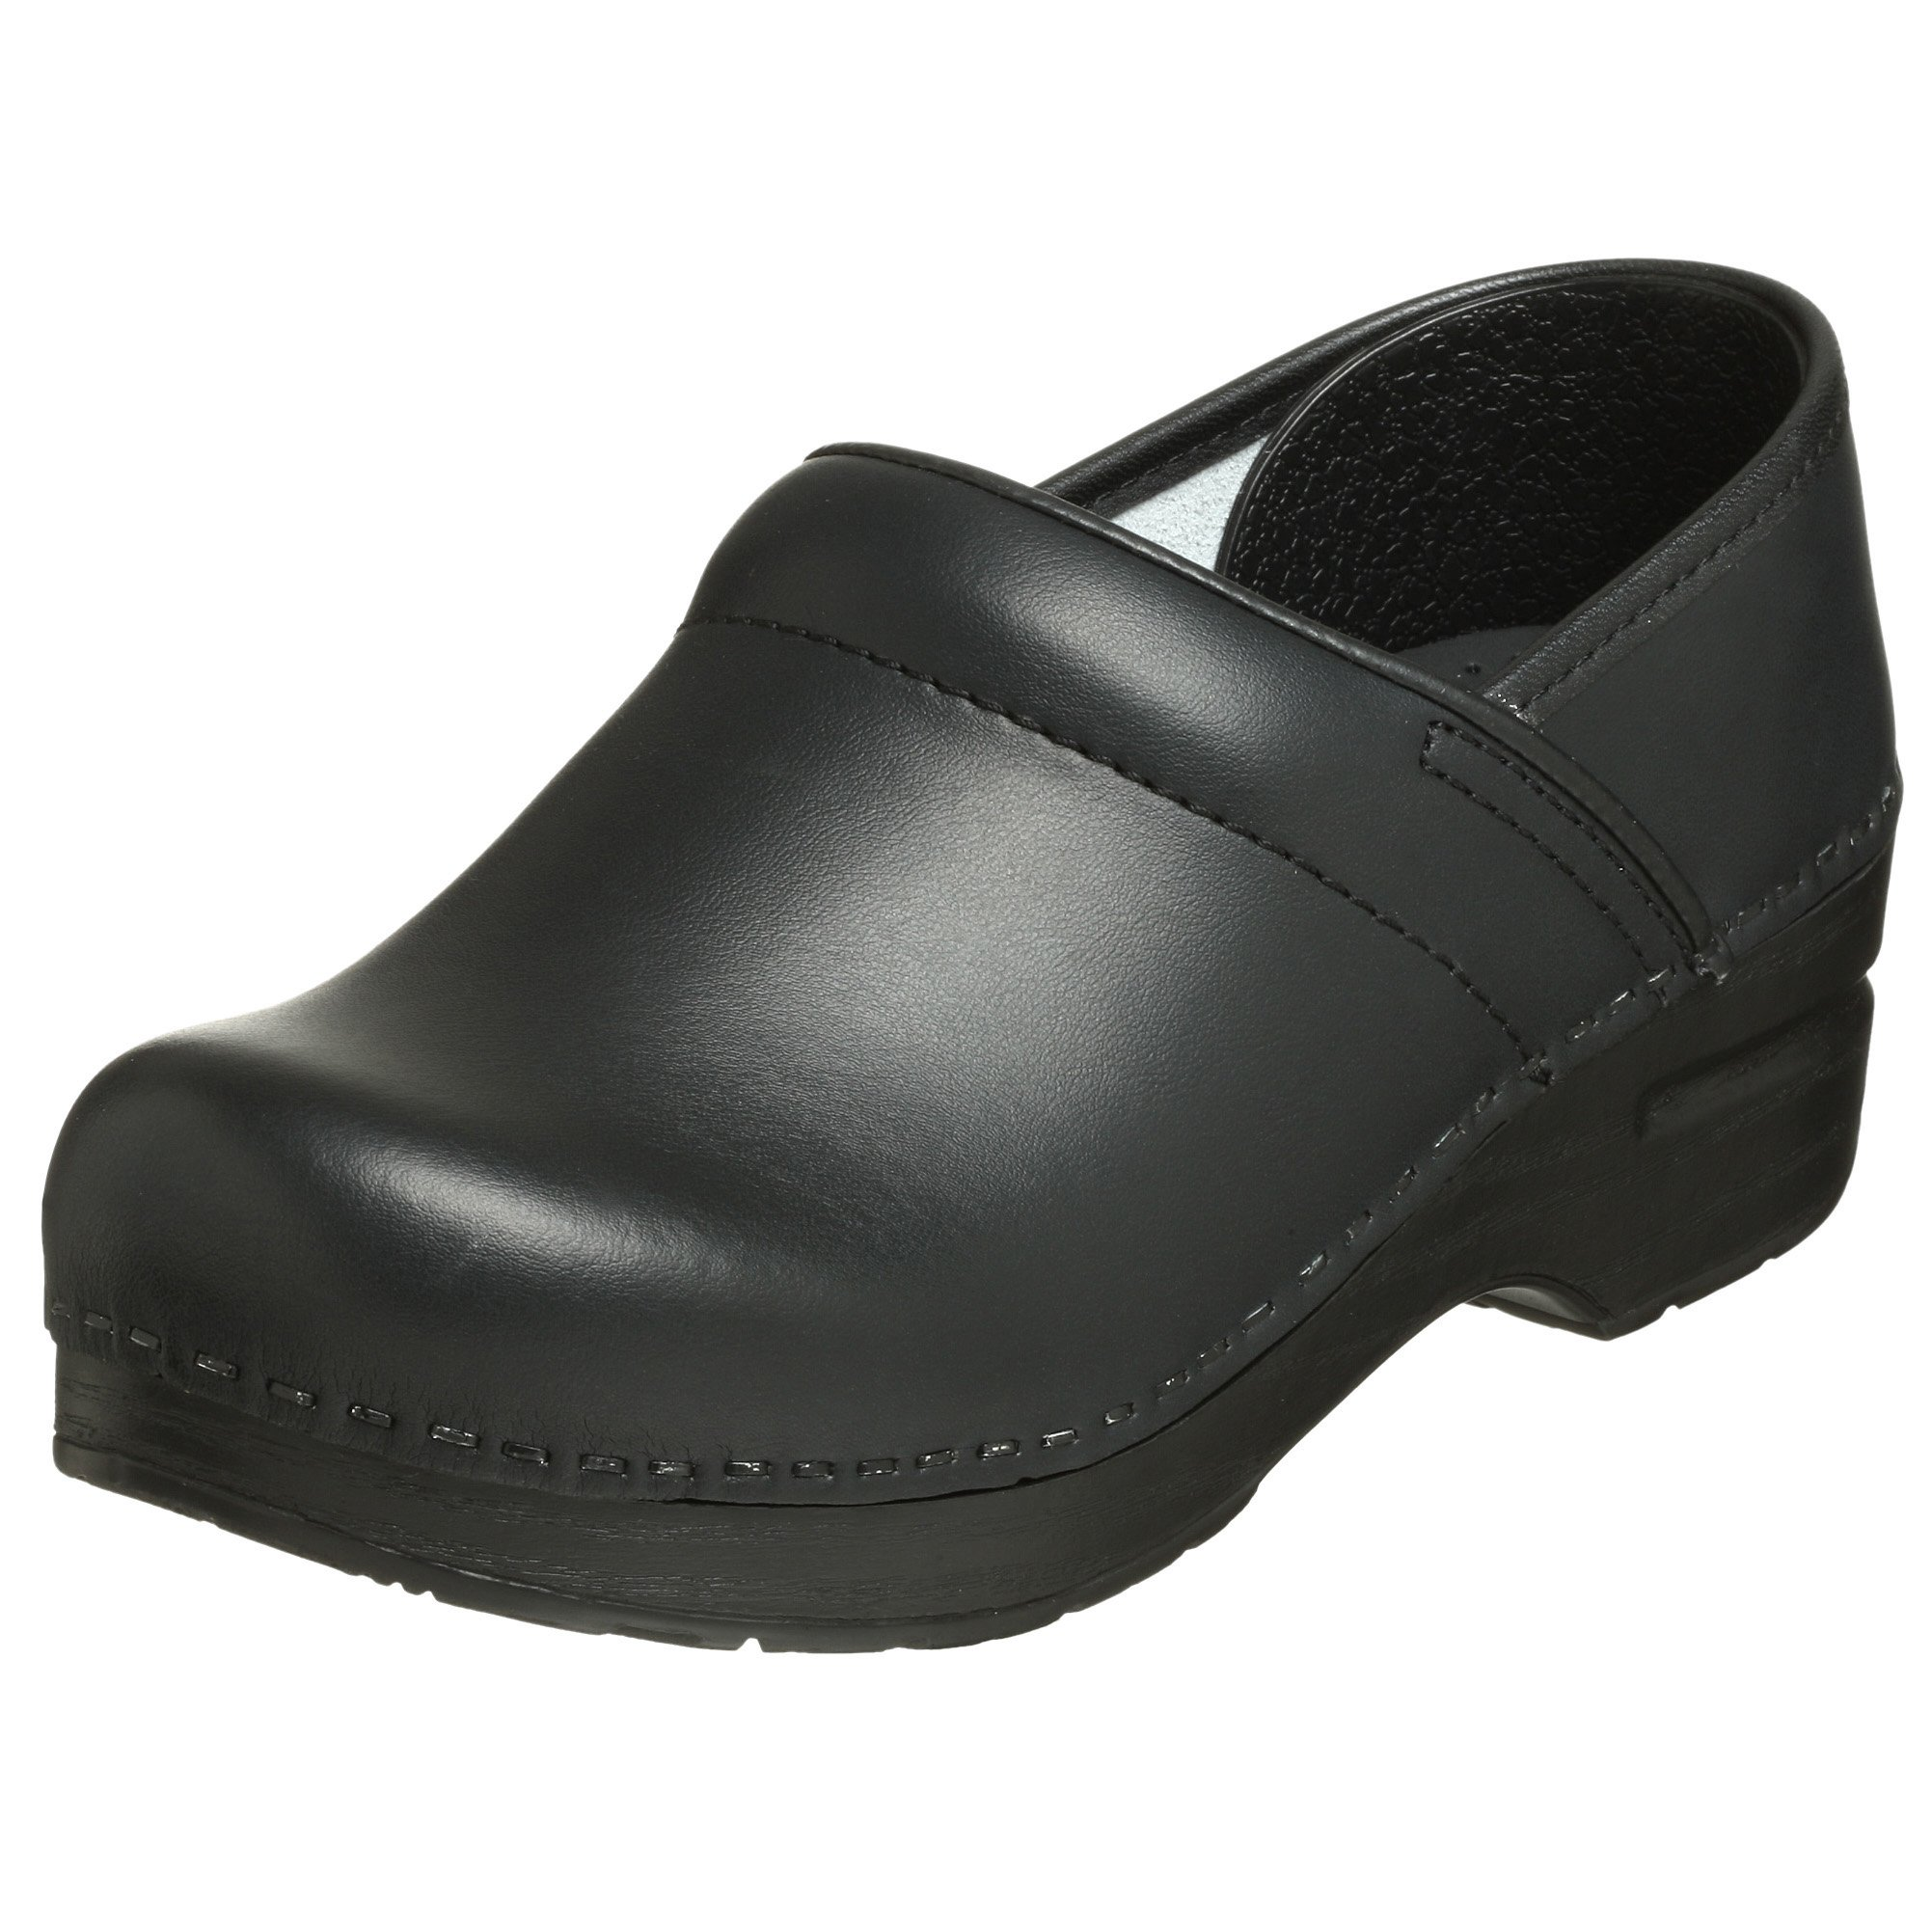 Dansko Women's Professional Box Leather Clog,Black,38 EU / 7.5-8 B(M) US